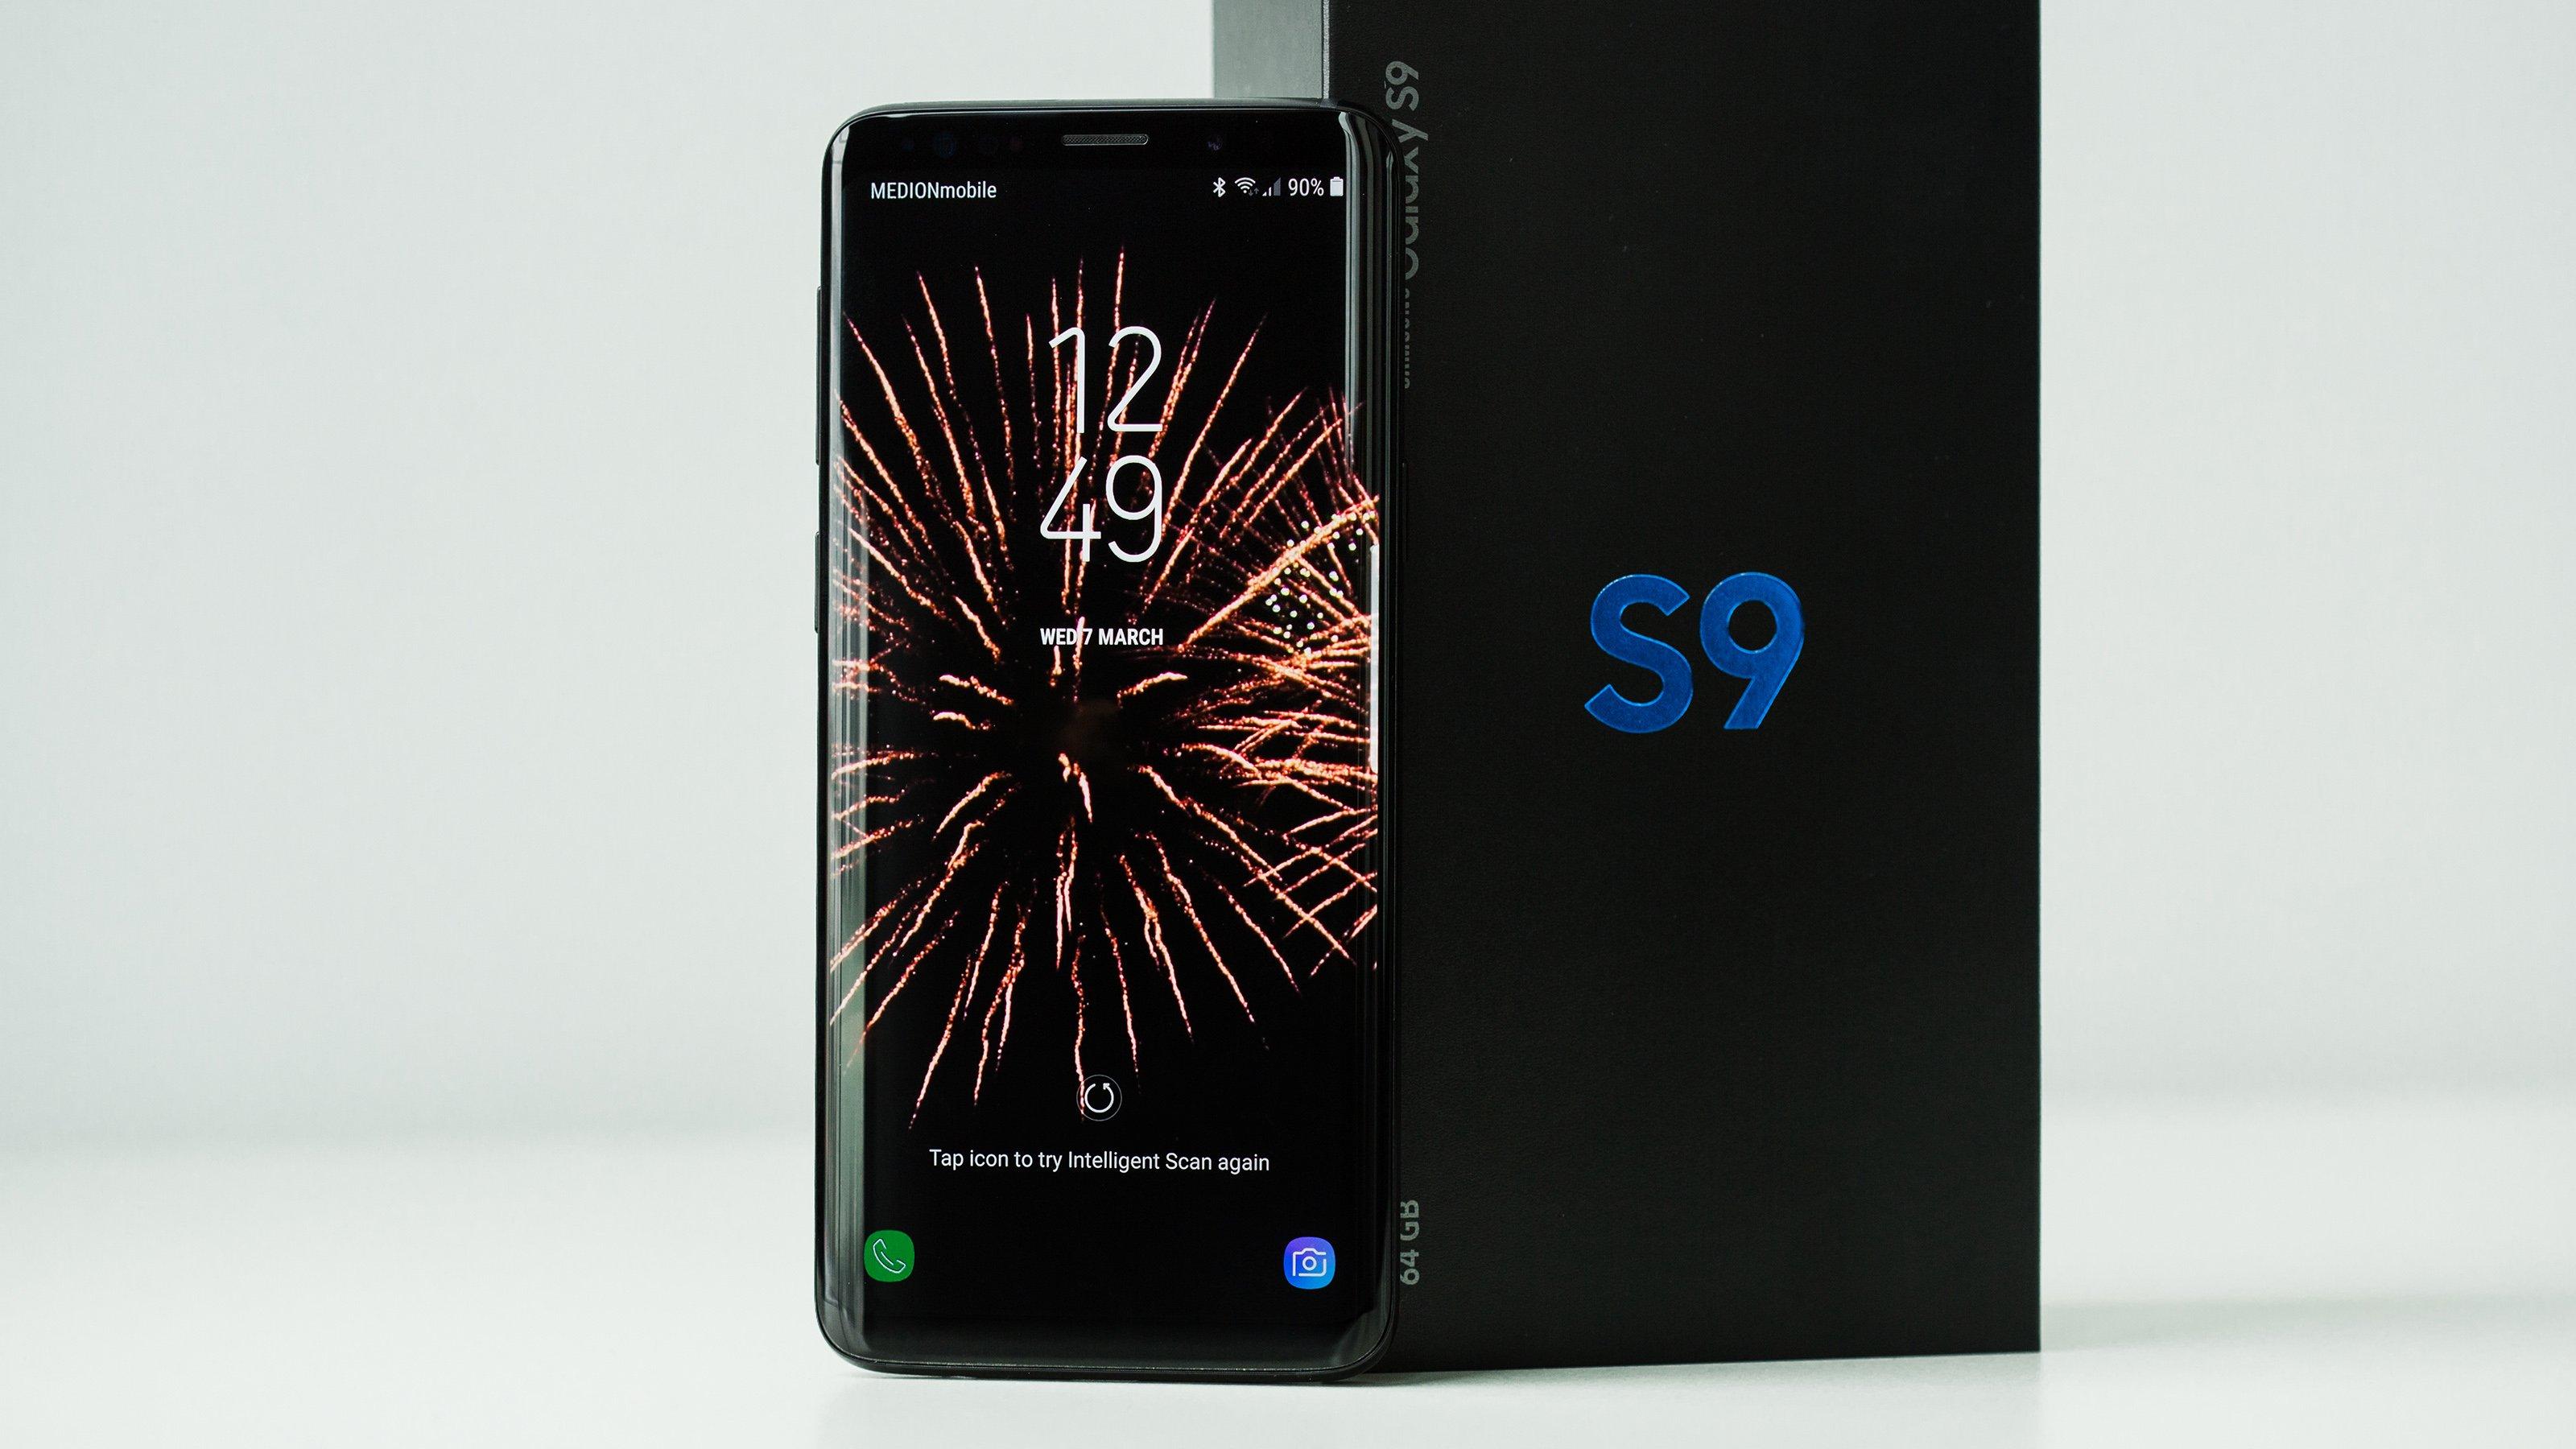 SAMSUNG GALAXY S9 BATTERITID